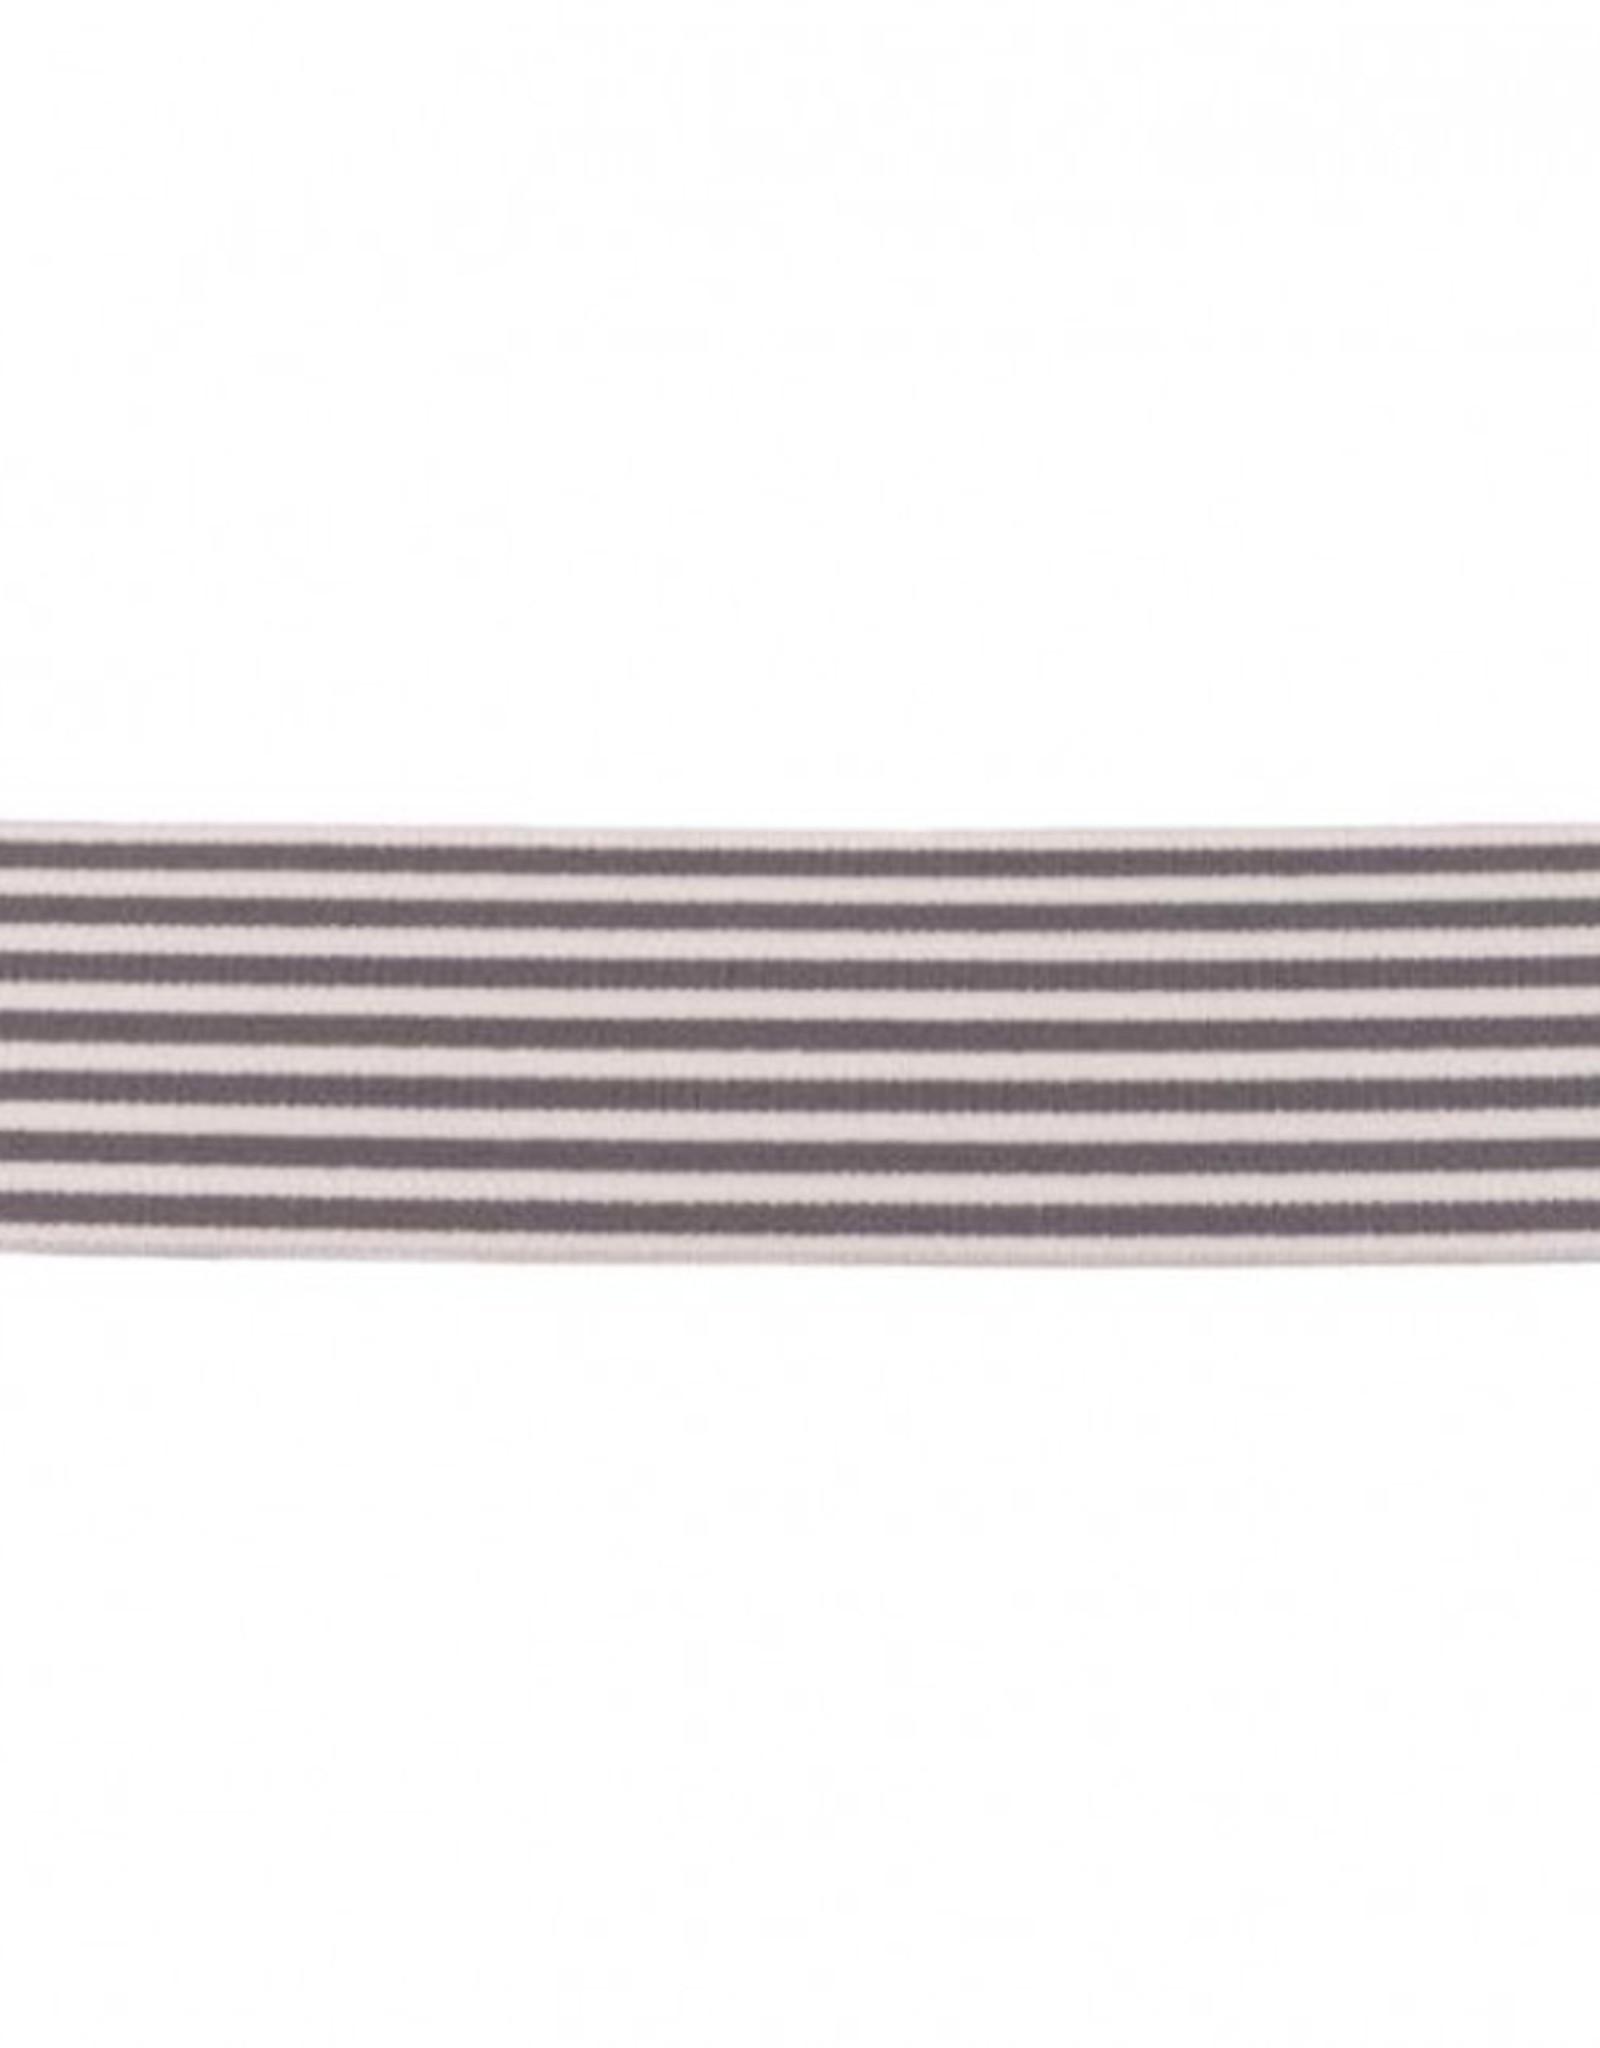 Elastiek met streep smal grijs-wit 40mm